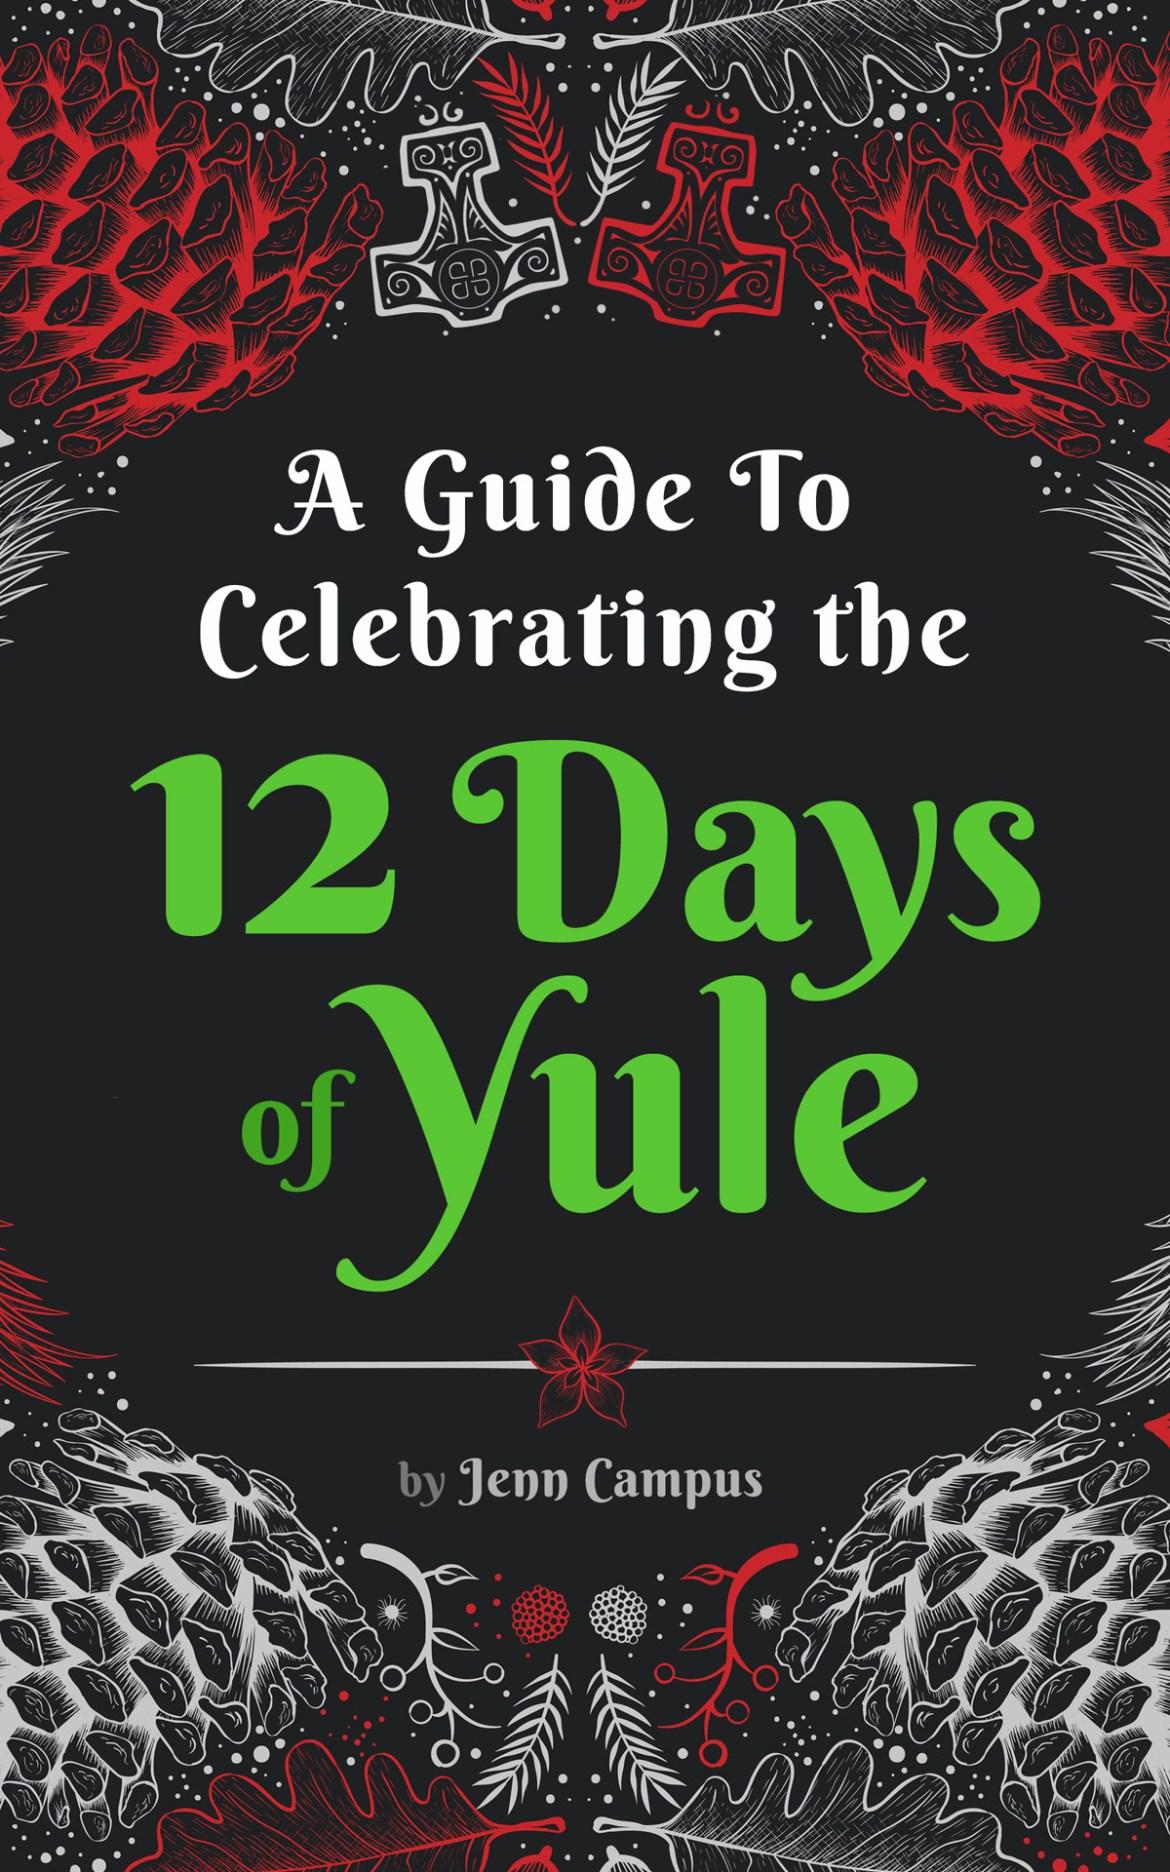 12 Days of Yule - Cover B Social Media